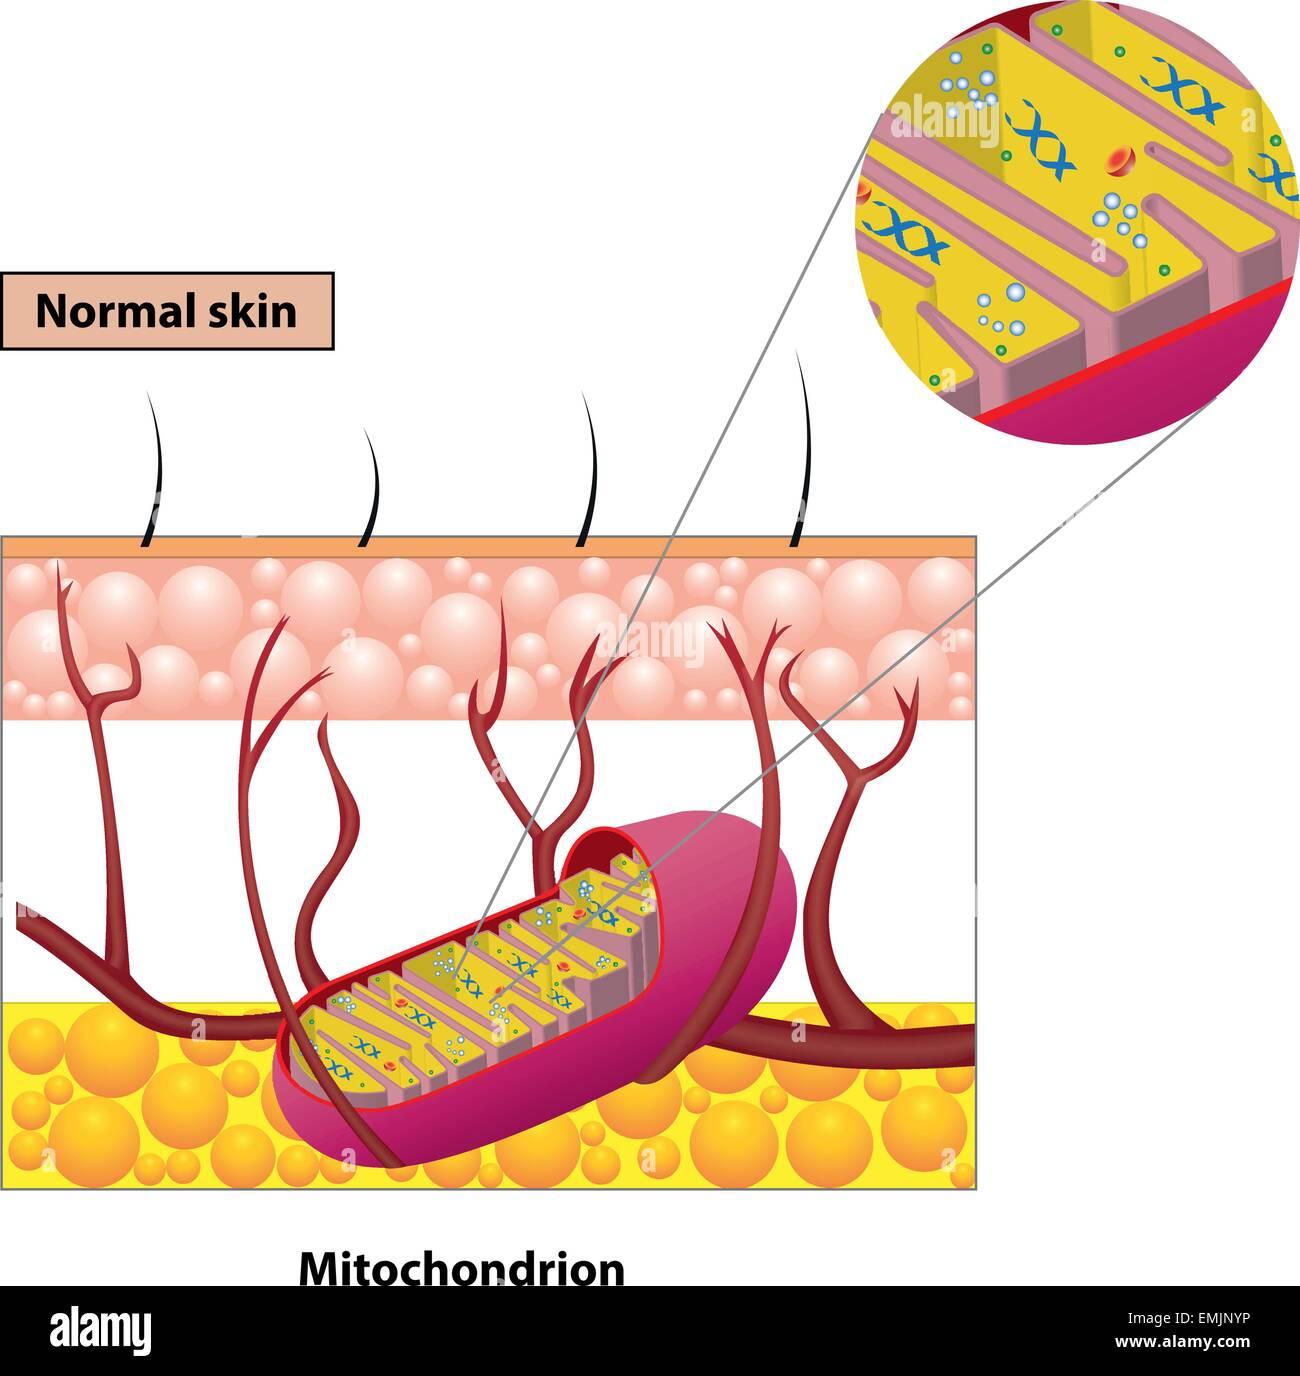 Mitochondrial Matrix Protein Stockfotos & Mitochondrial Matrix ...